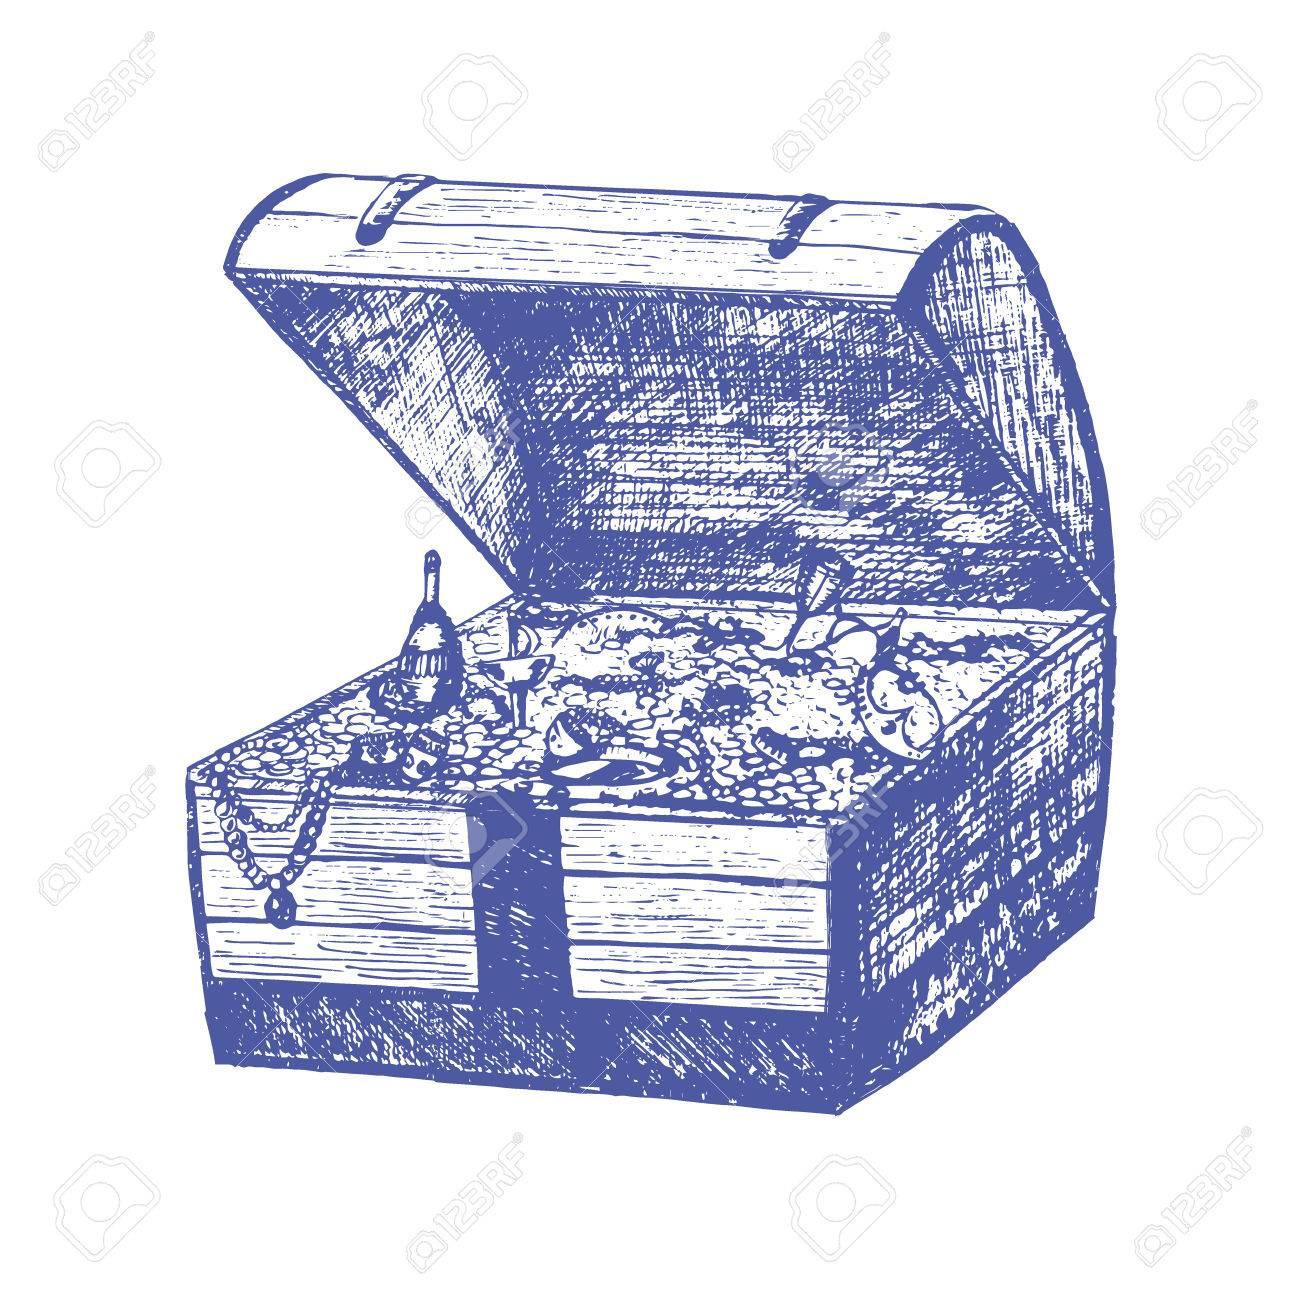 1300x1300 Open Full Pirate Treasure Chest And Coin Hand Draw Sketch. Retro